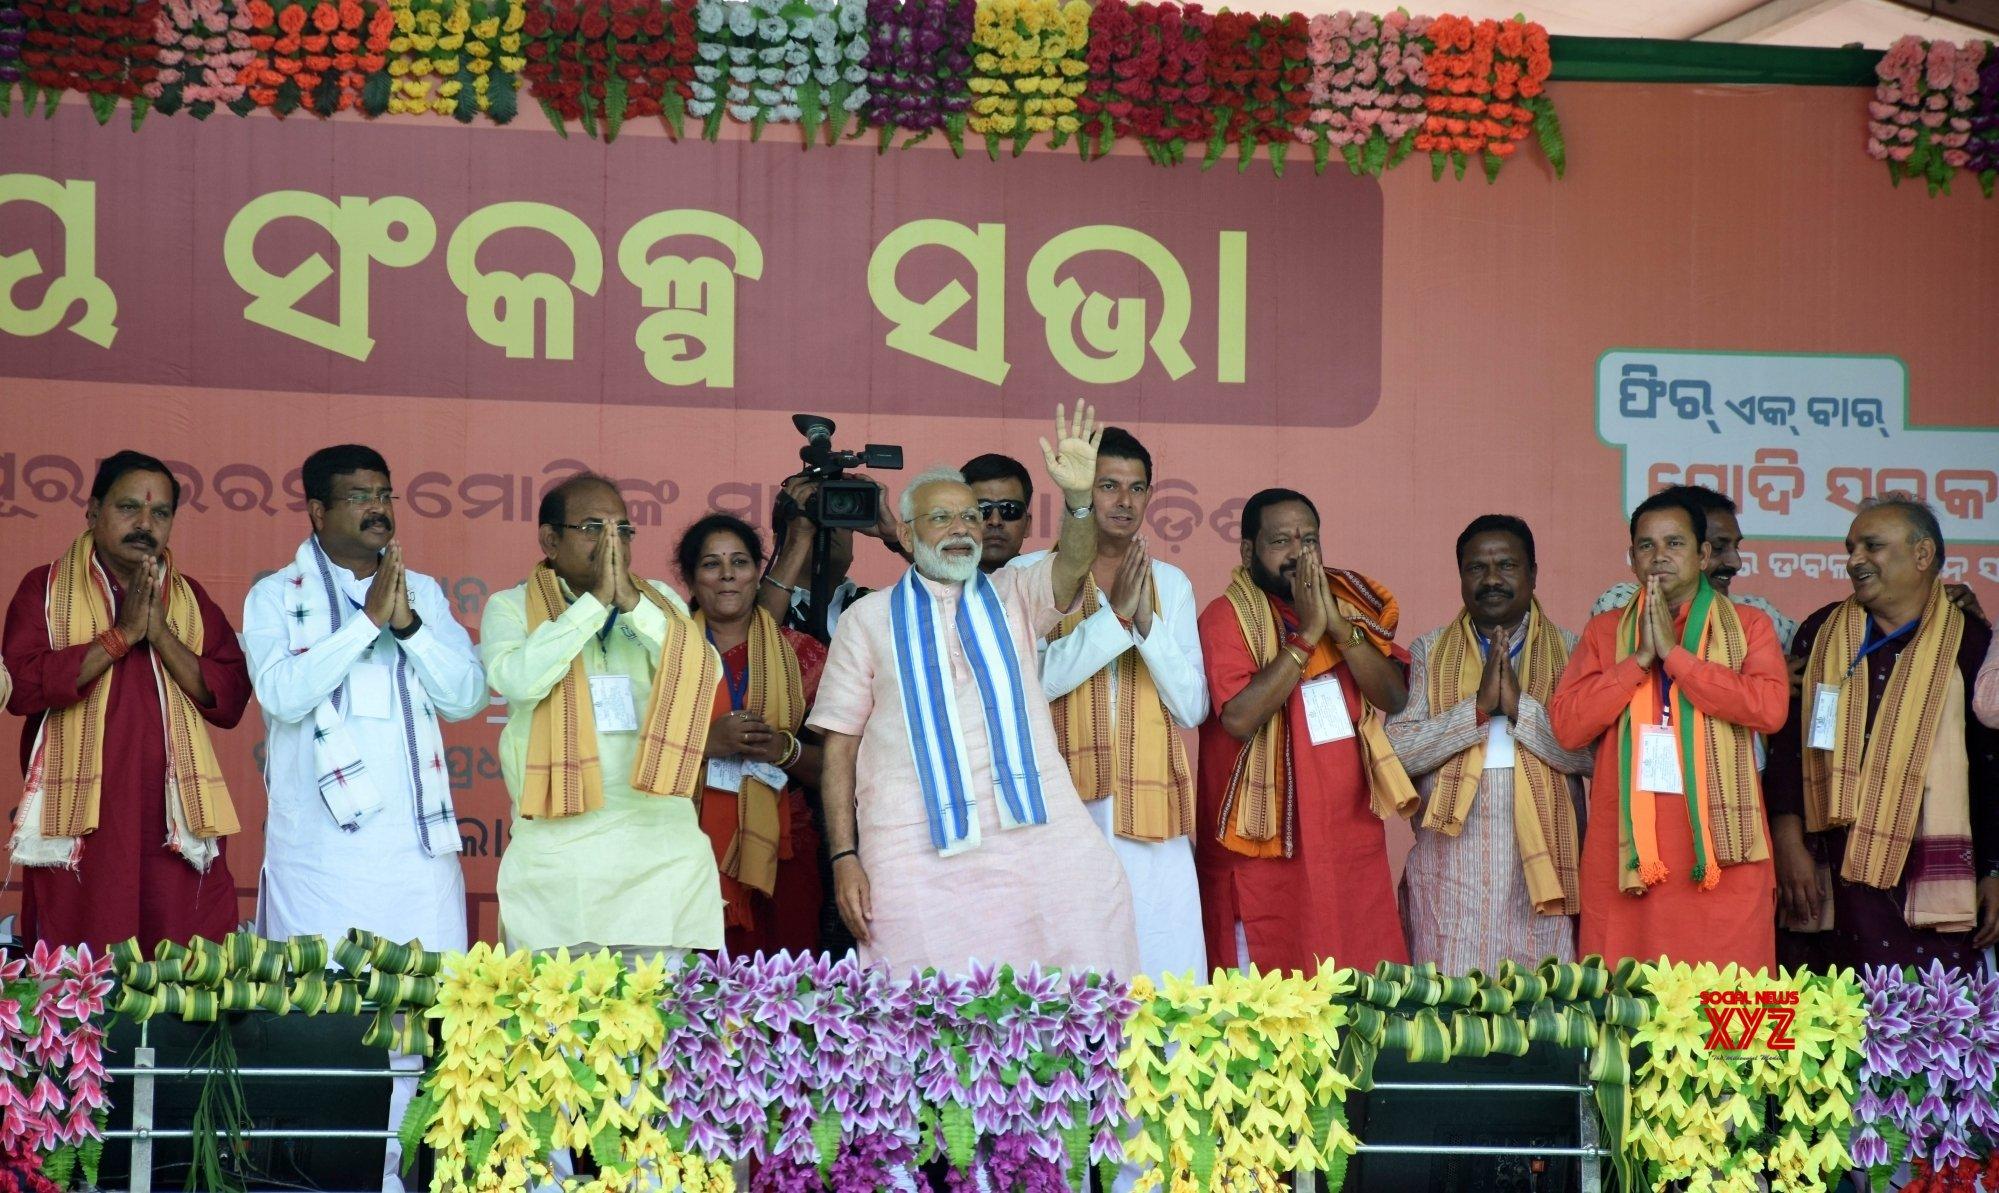 Sambalpur: PM Modi at public rally in Odisha (Batch - 2) #Gallery